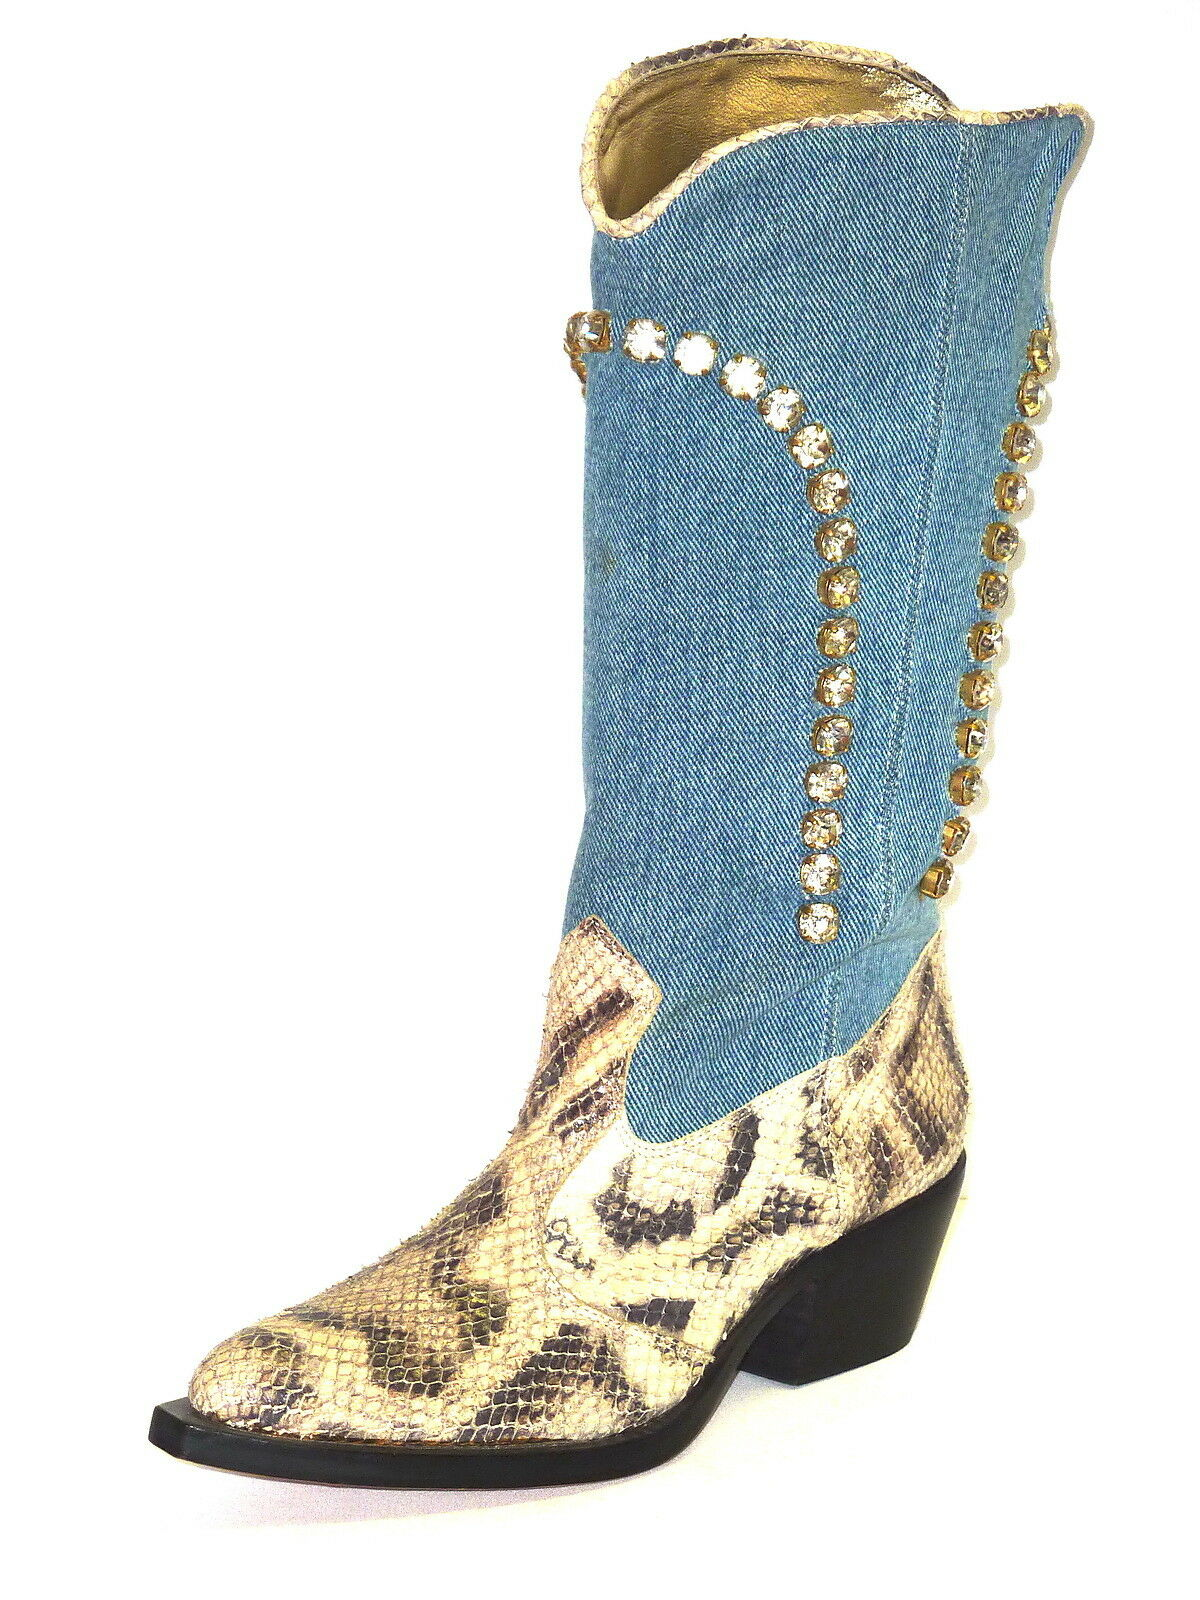 AMARANTI botas TEXANI zapatos mujer SWAROVSKI PITONE PITONE PITONE 39  mas barato